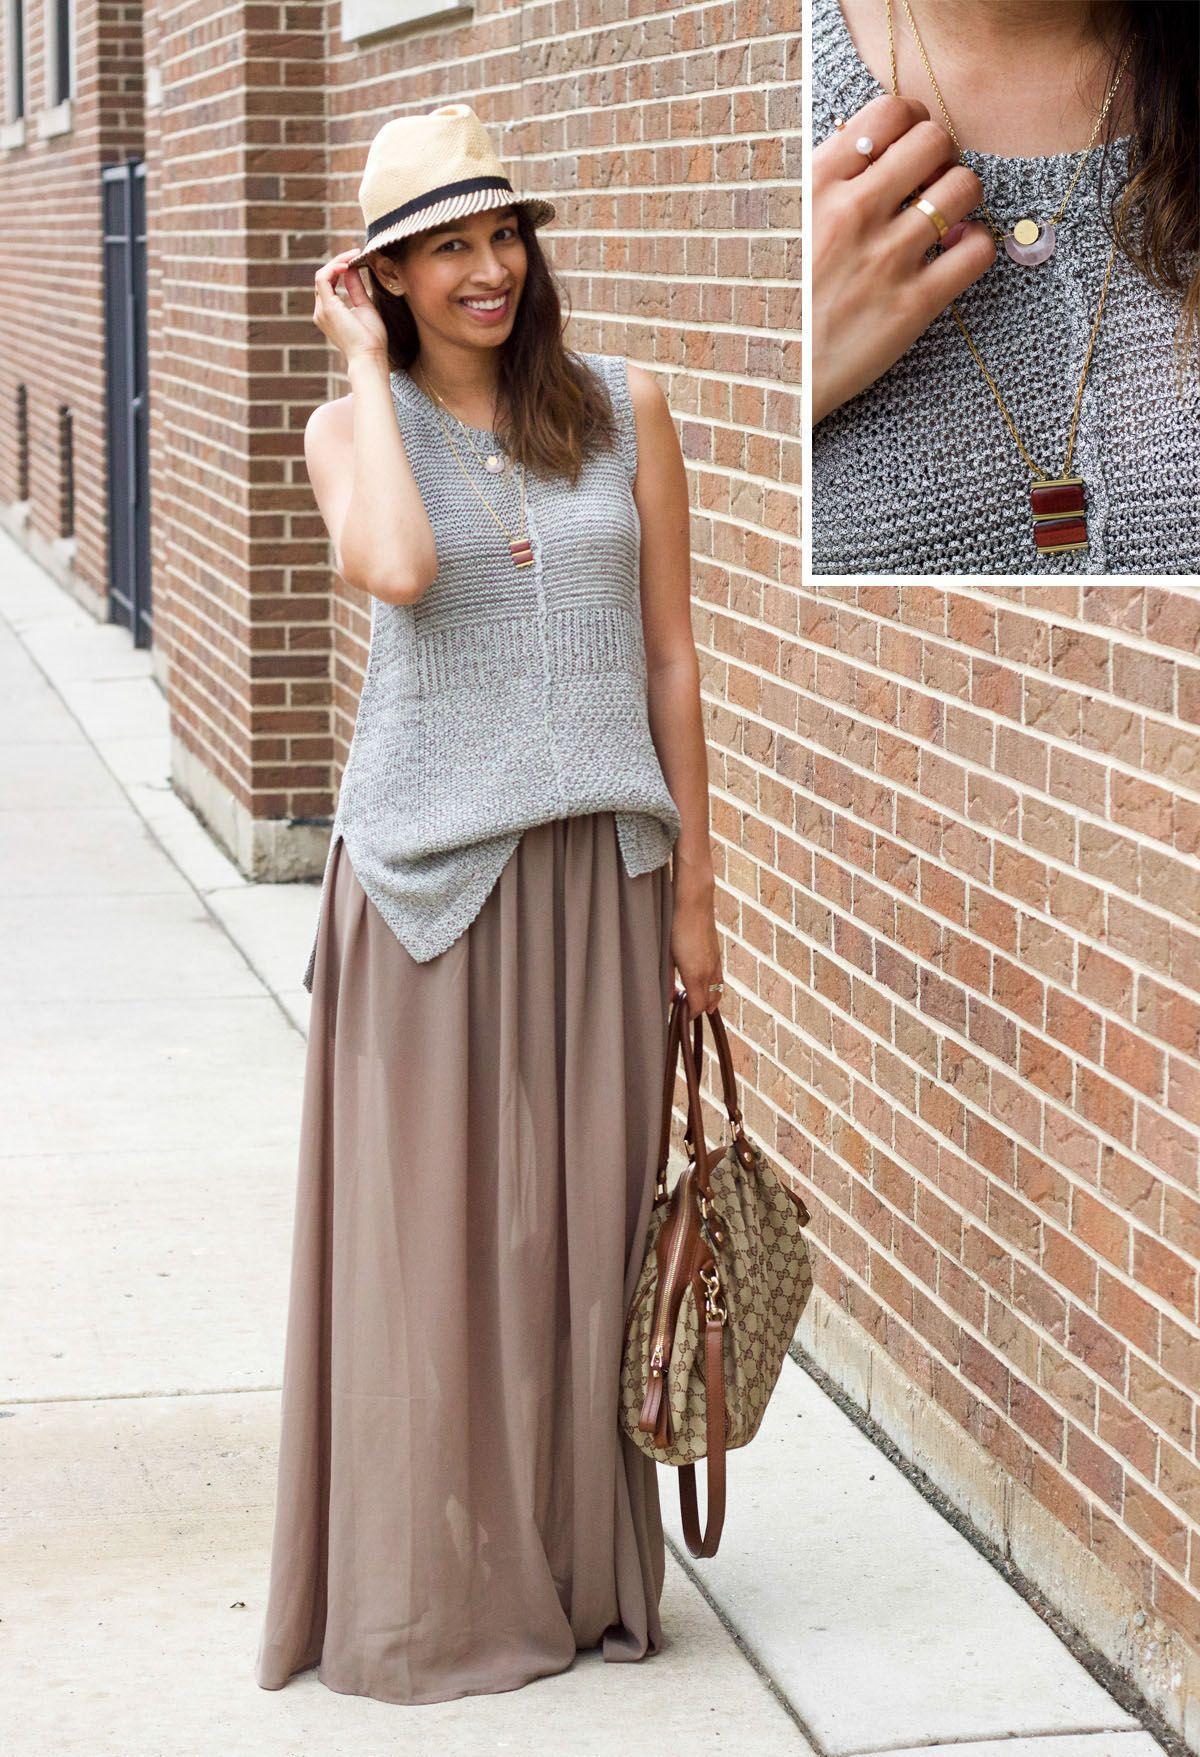 "Foto: Reprodução / <a href=""http://www.lowstoluxe.com/maxi-skirt-2/"" target=""_blank"">Lows to Luxe</a>"